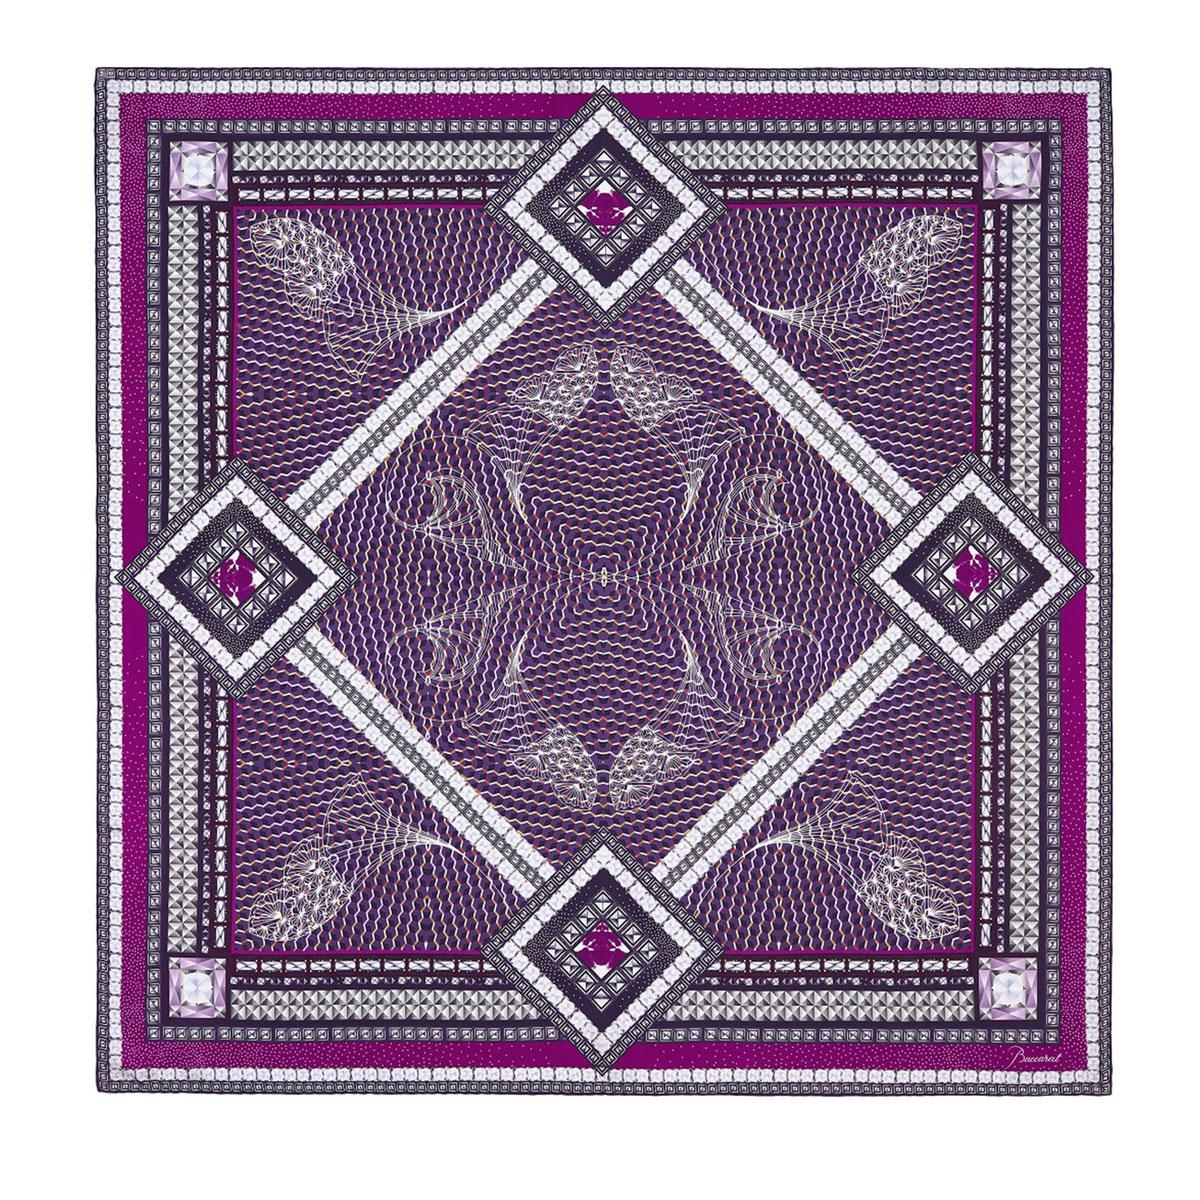 "Baccarat Louxor Silk Twill Scarf Carre 39"" X 39"", Purple"